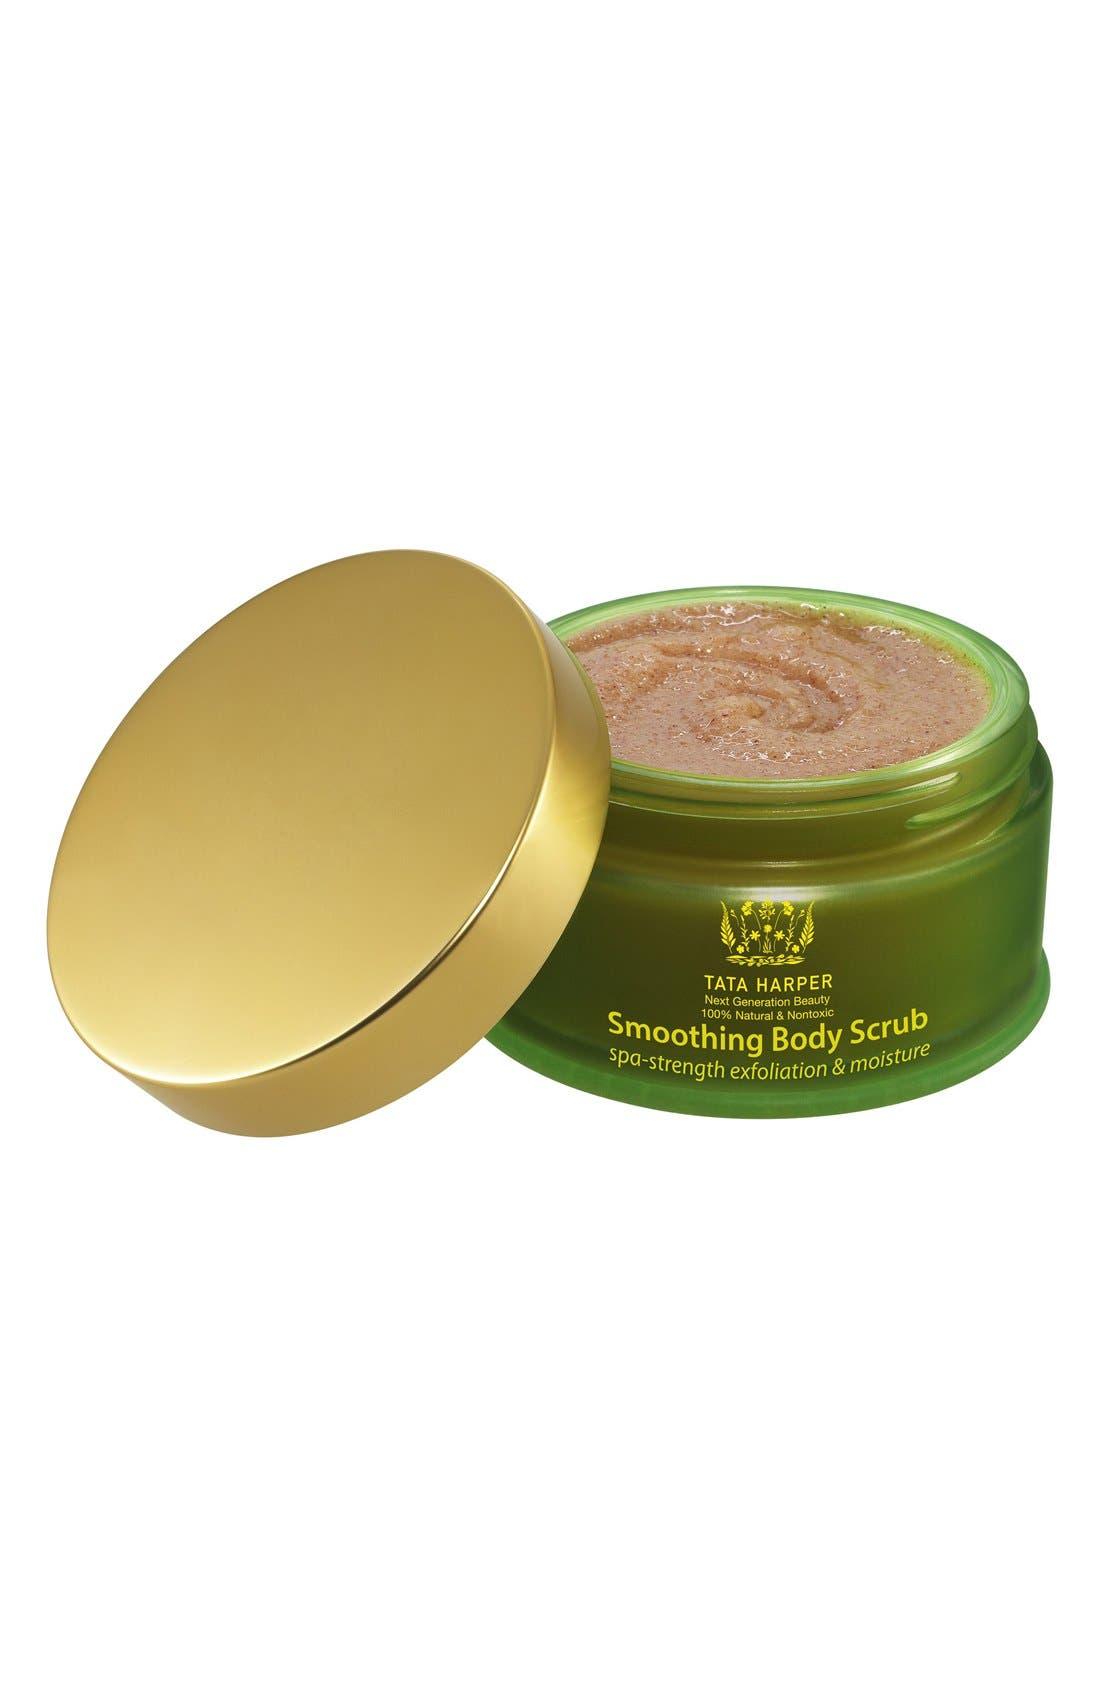 Tata Harper Skincare Smoothing Body Scrub